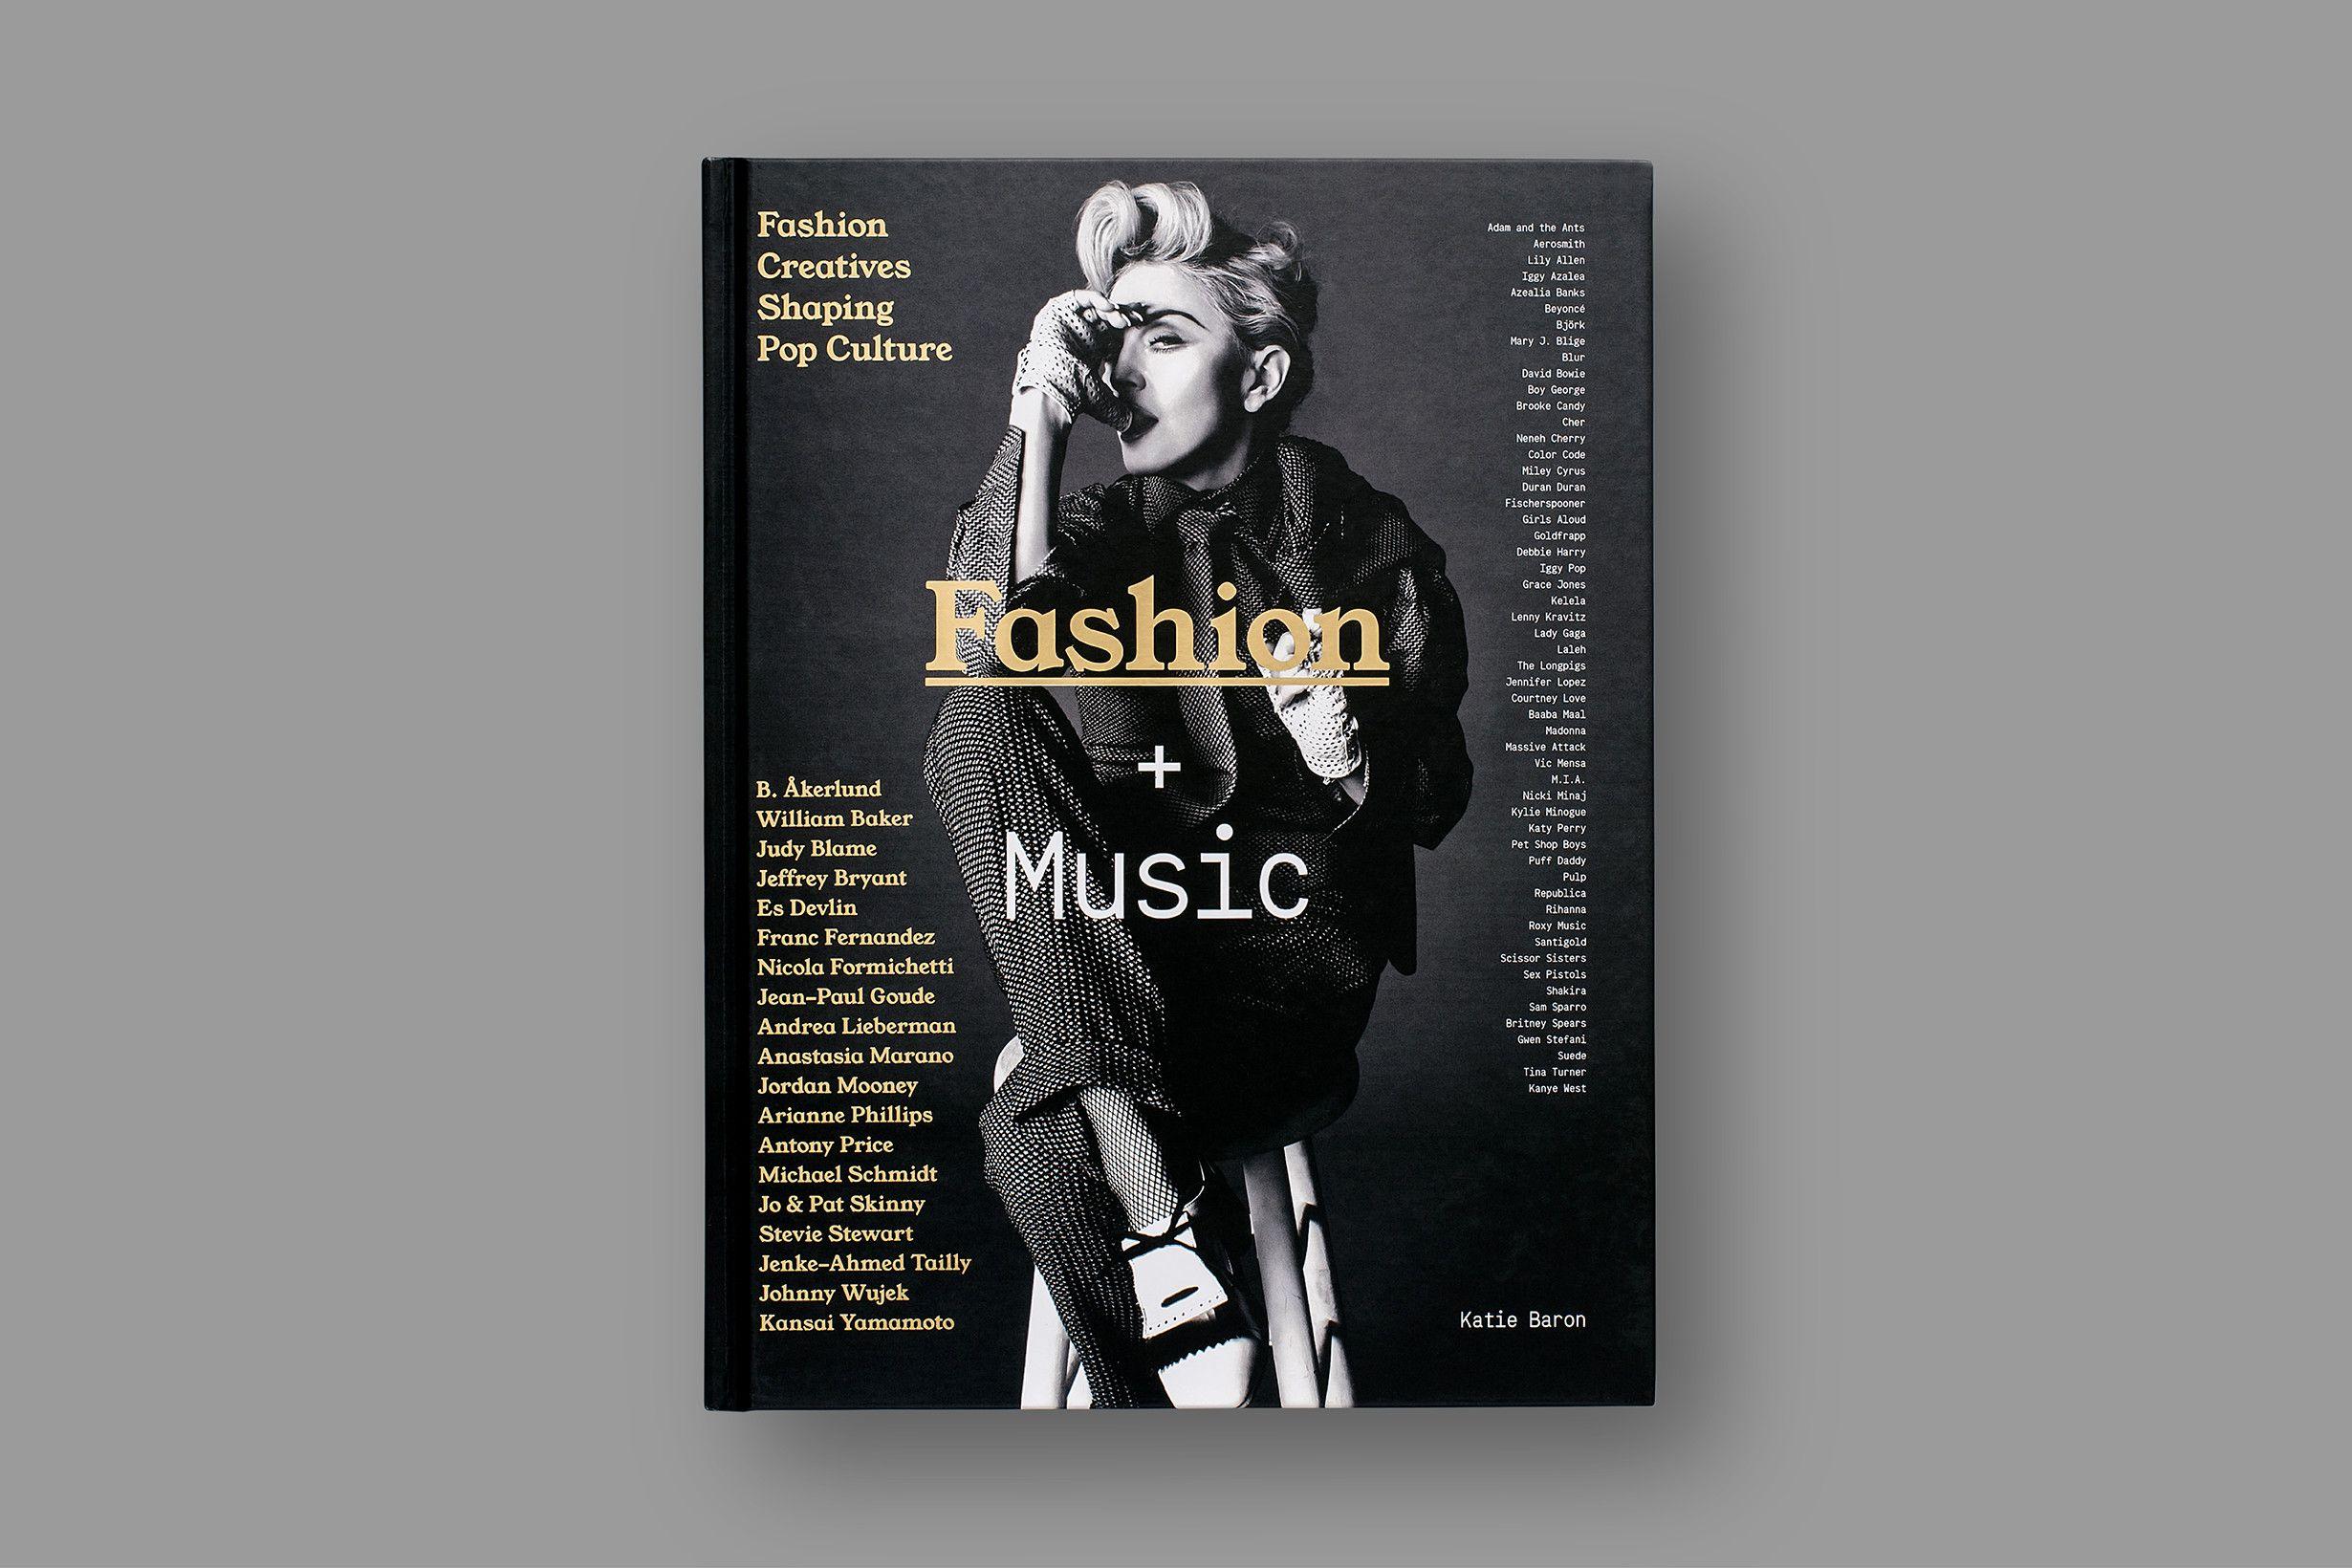 Intercity Fashion Music Cover Music Fashion Pop Culture Fashion Pop Culture